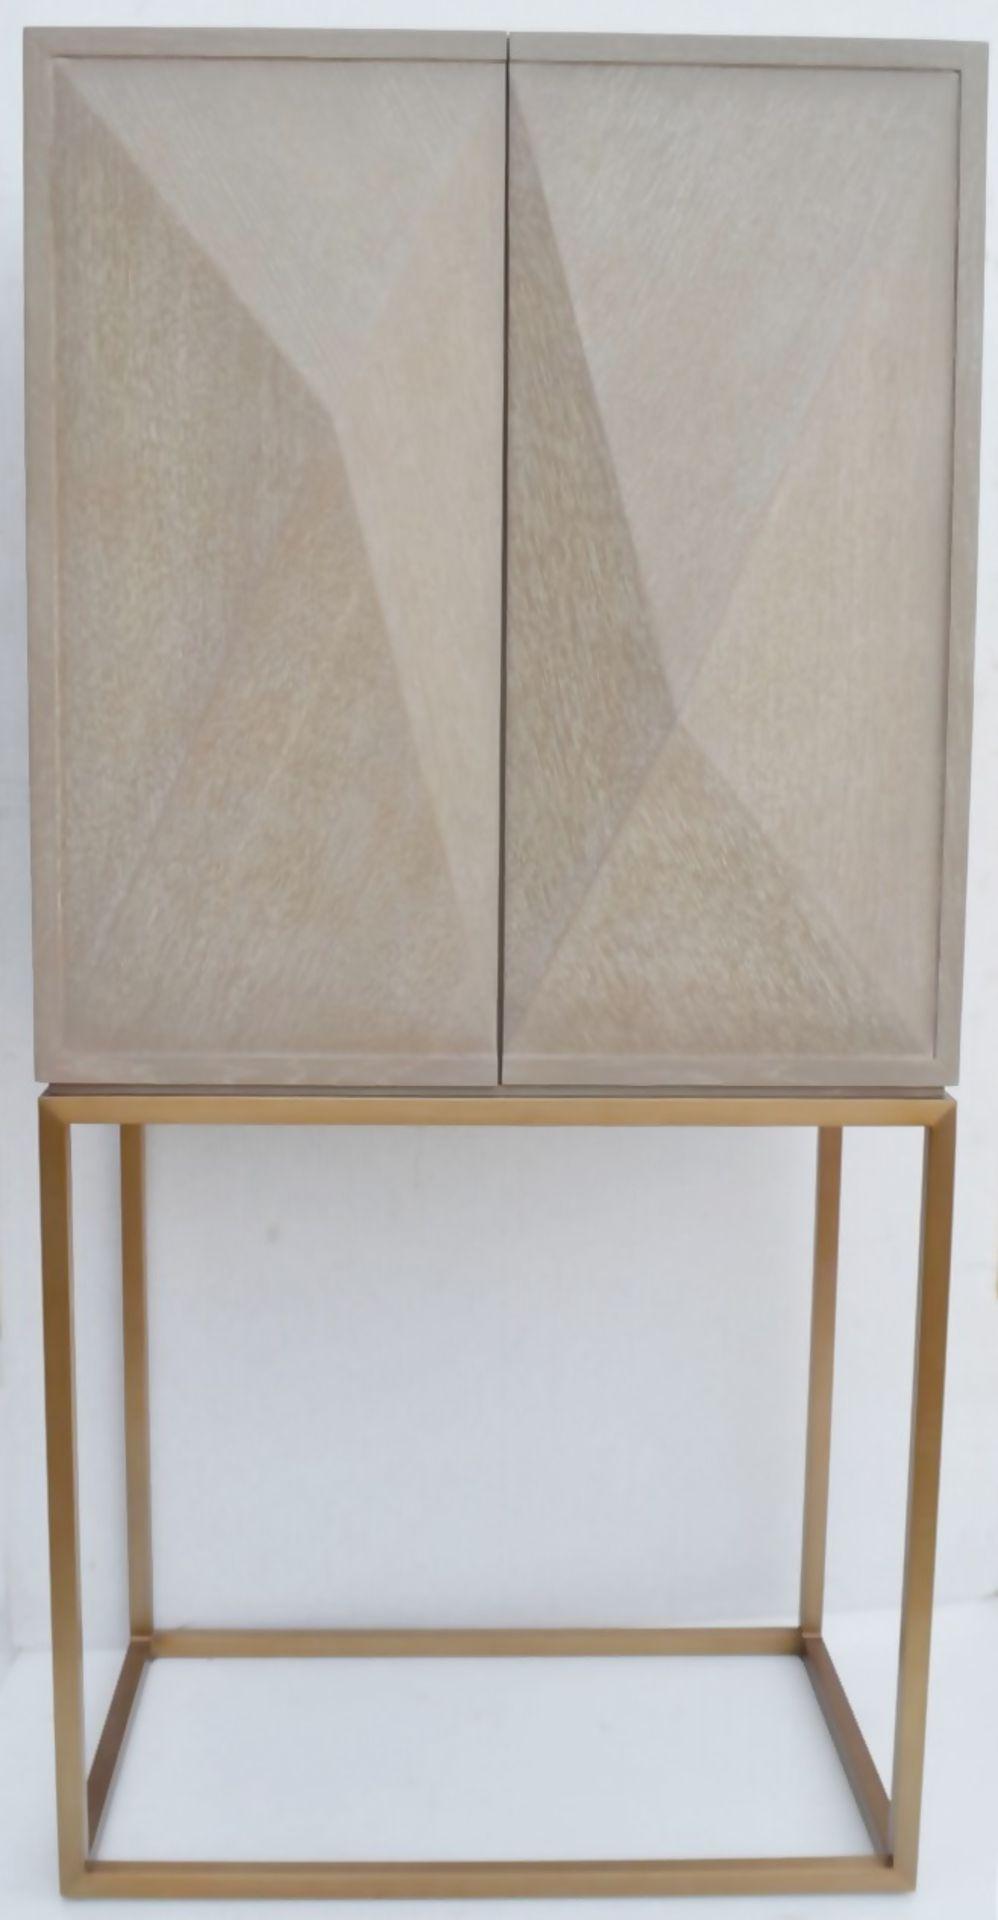 1 x EICHHOLTZ 'Delarenta' Wine Cabinet In Washed Oak And Brass - Original RRP £3,289 - Image 9 of 11